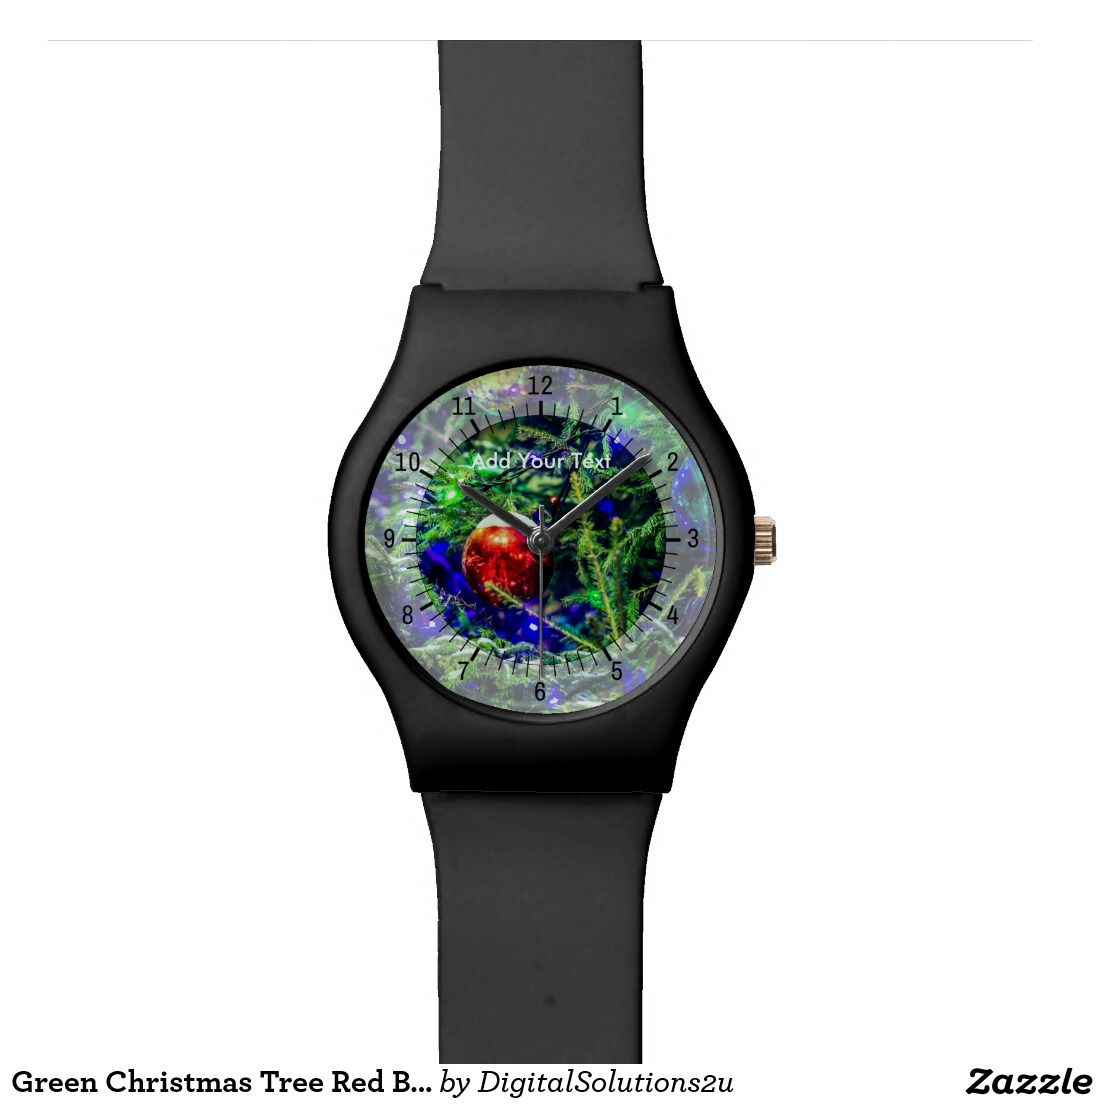 Green Christmas Tree Red Ball Wrist Watch